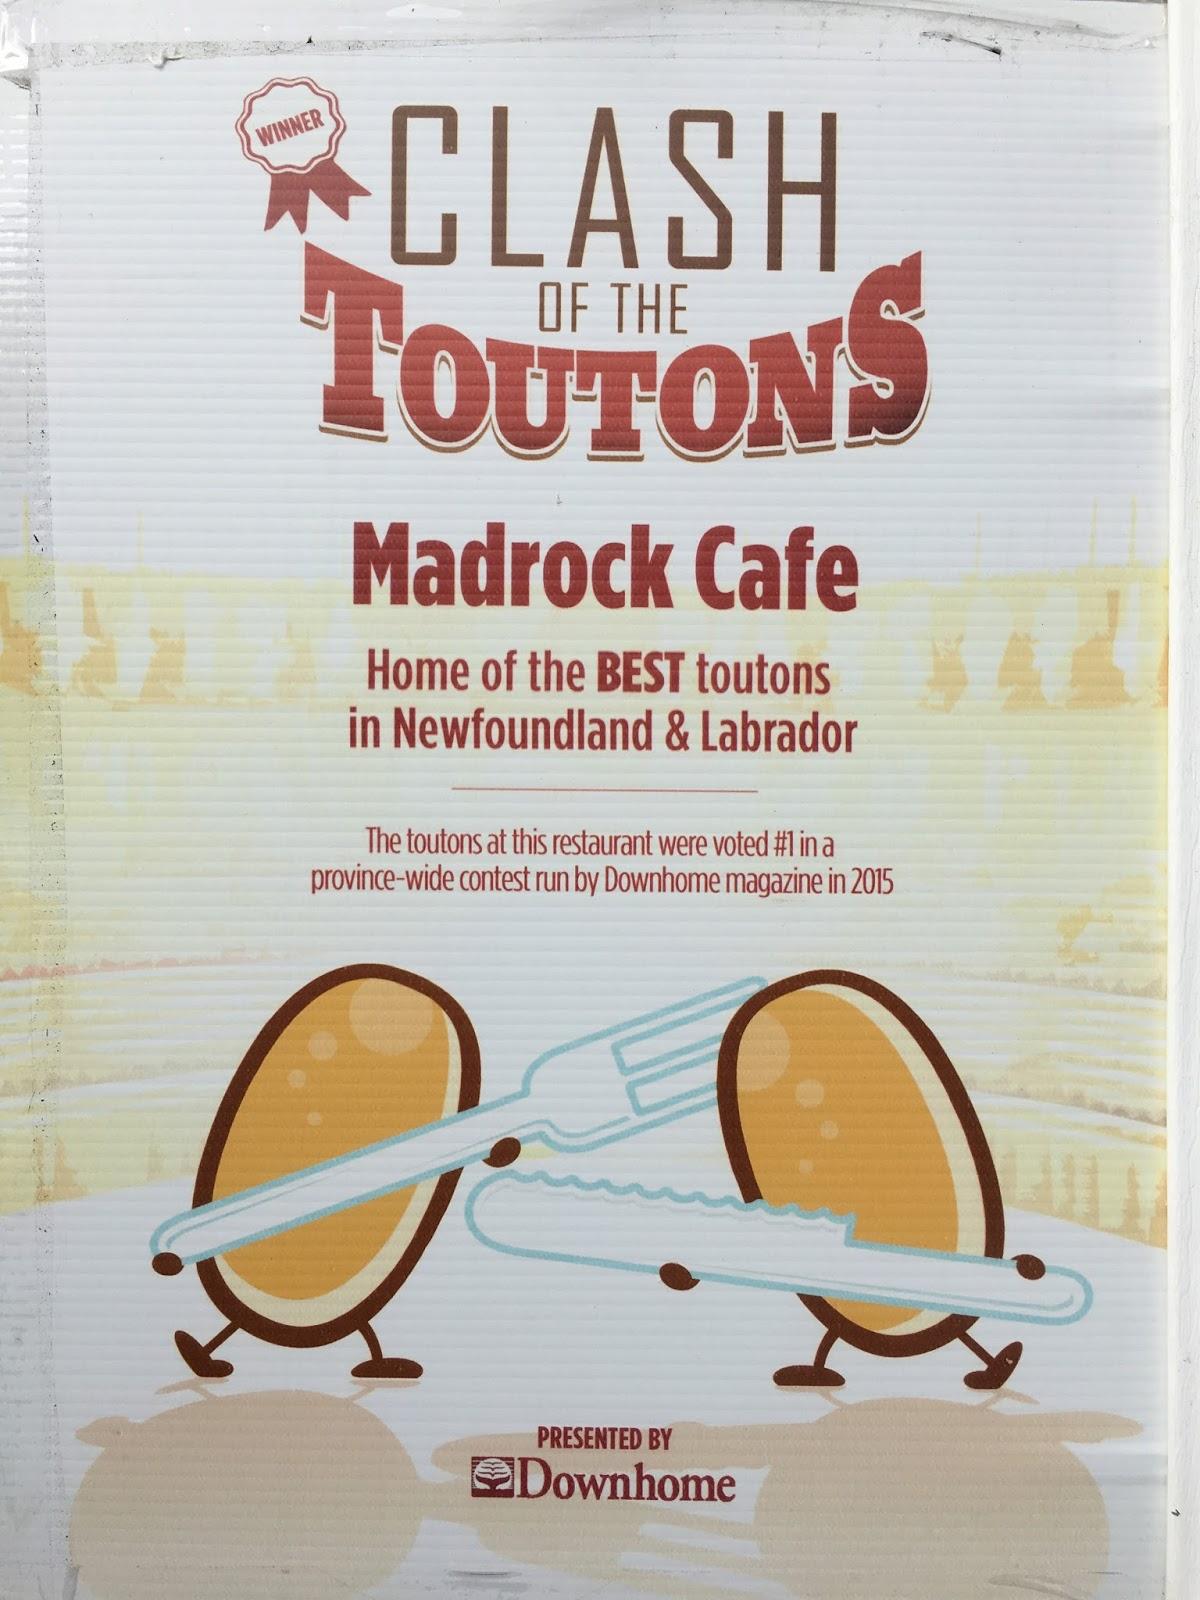 Mad Rock Cafe